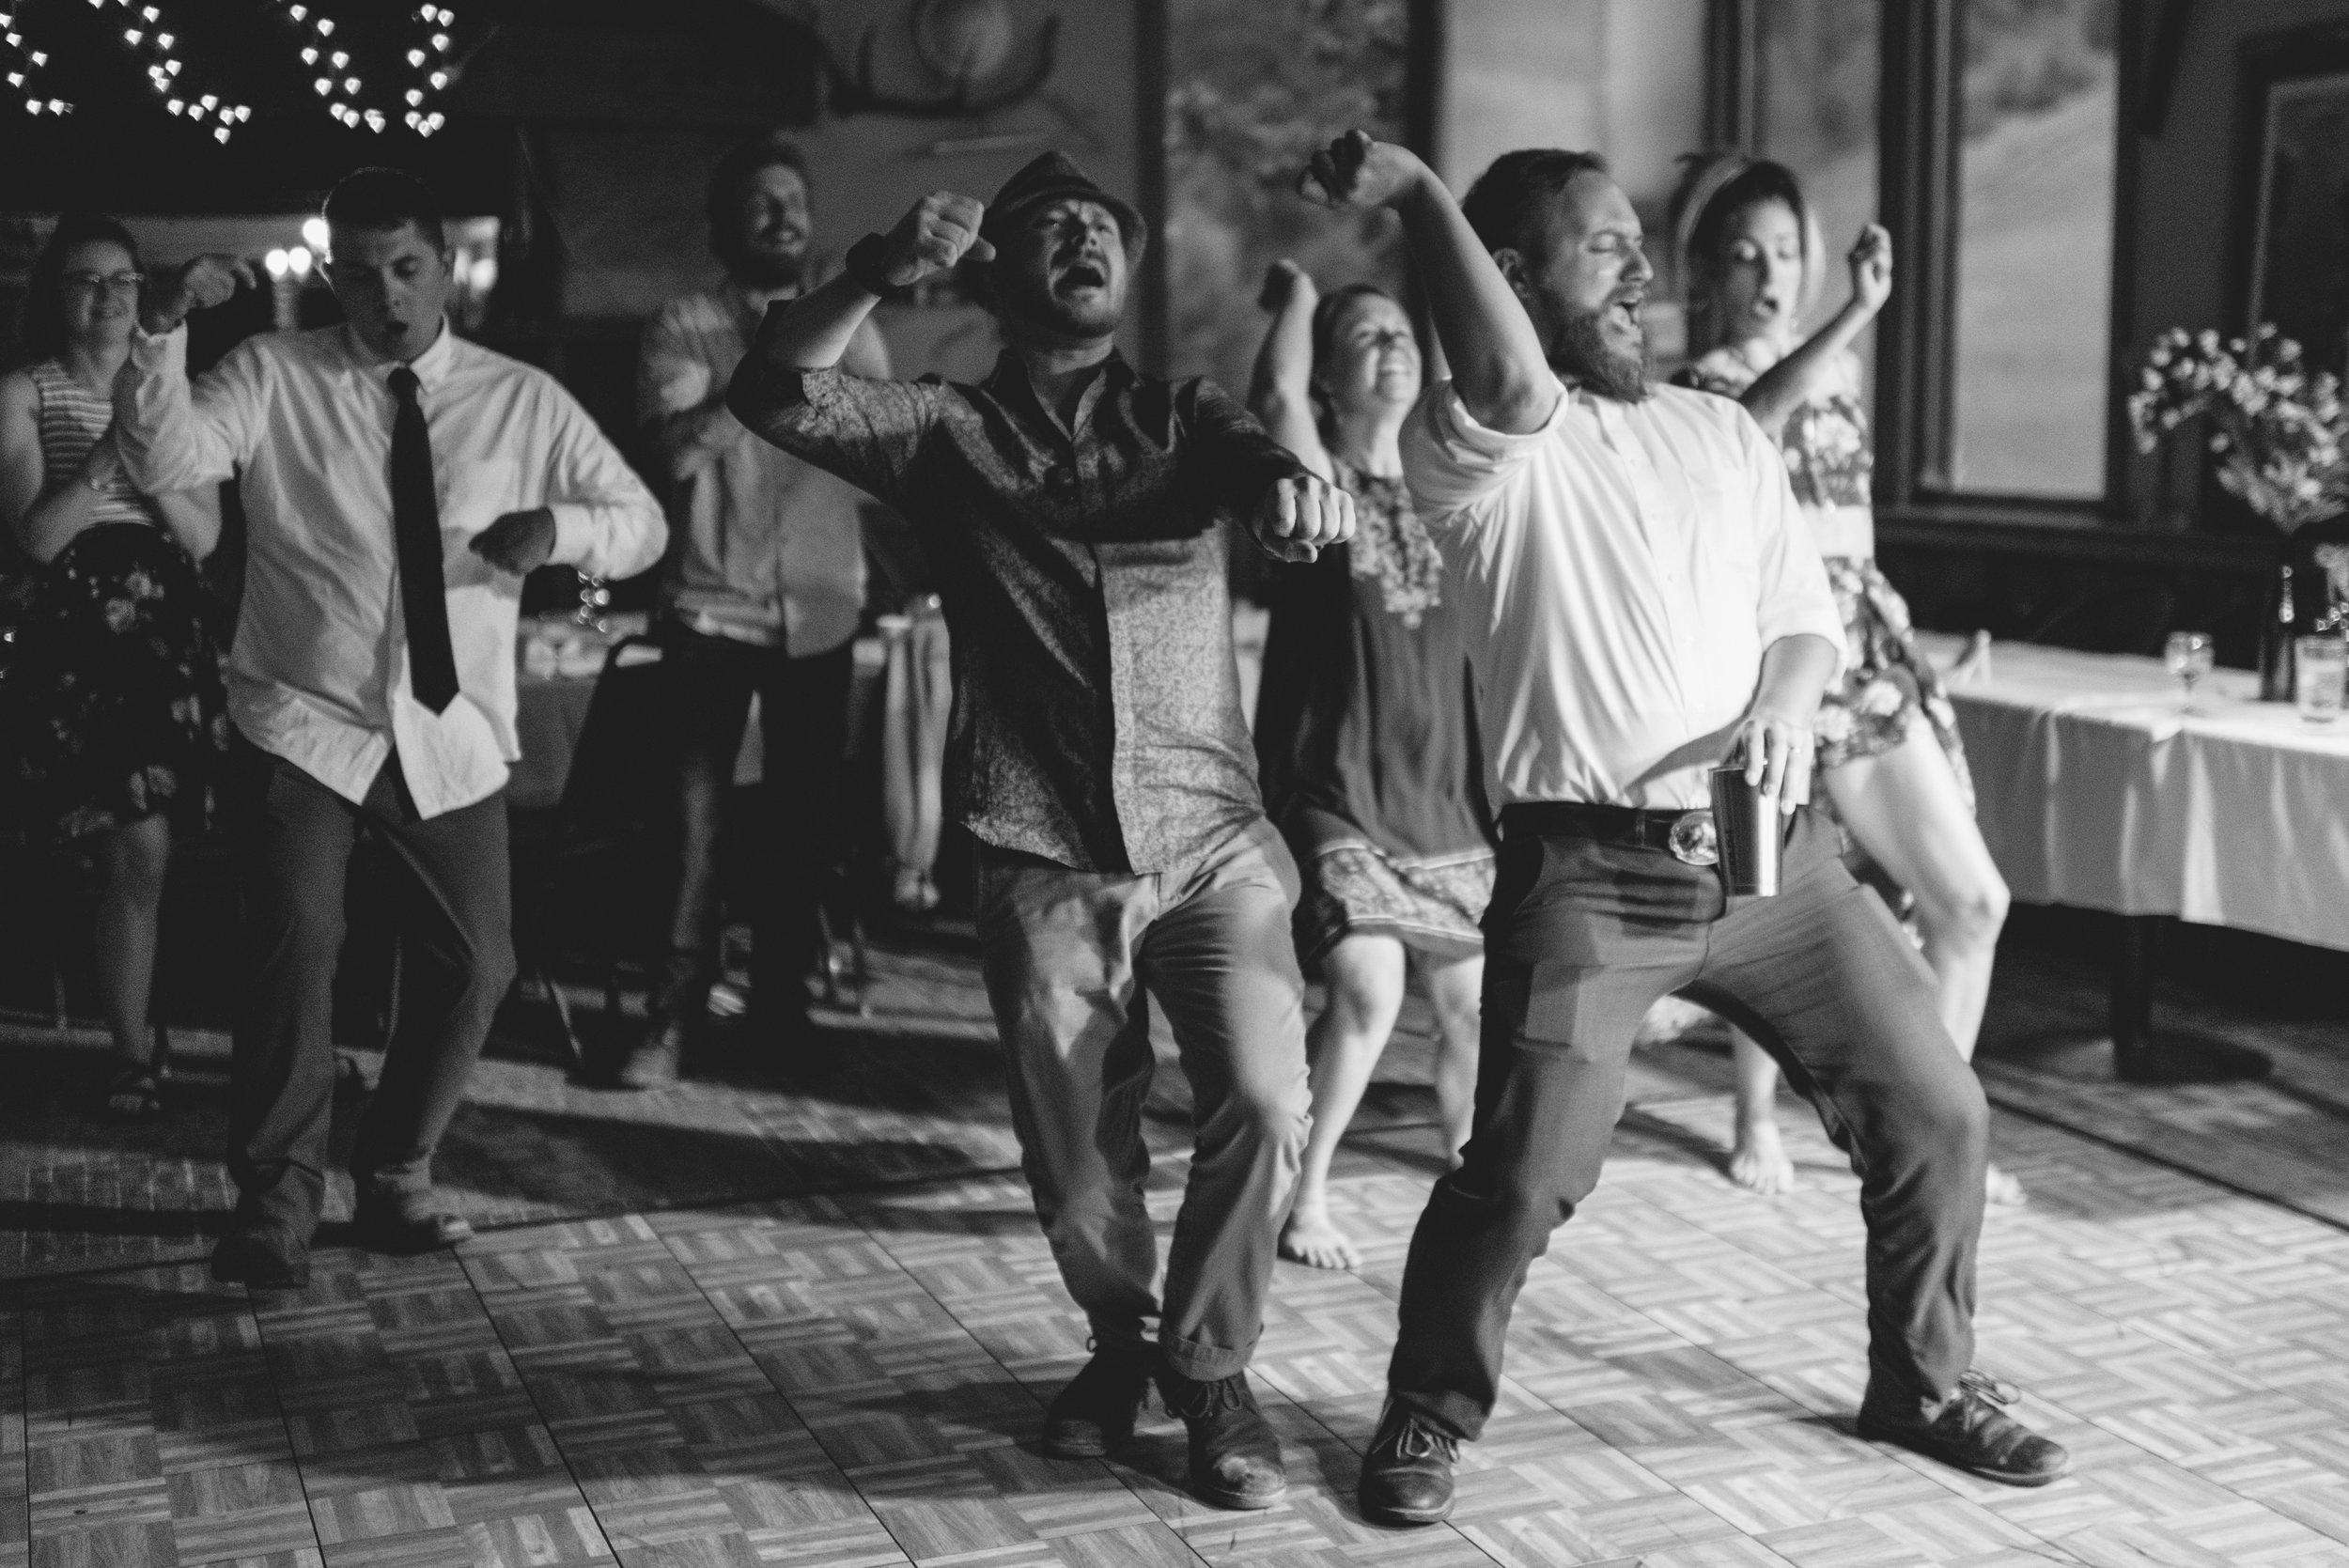 walton_dancing_010.jpg